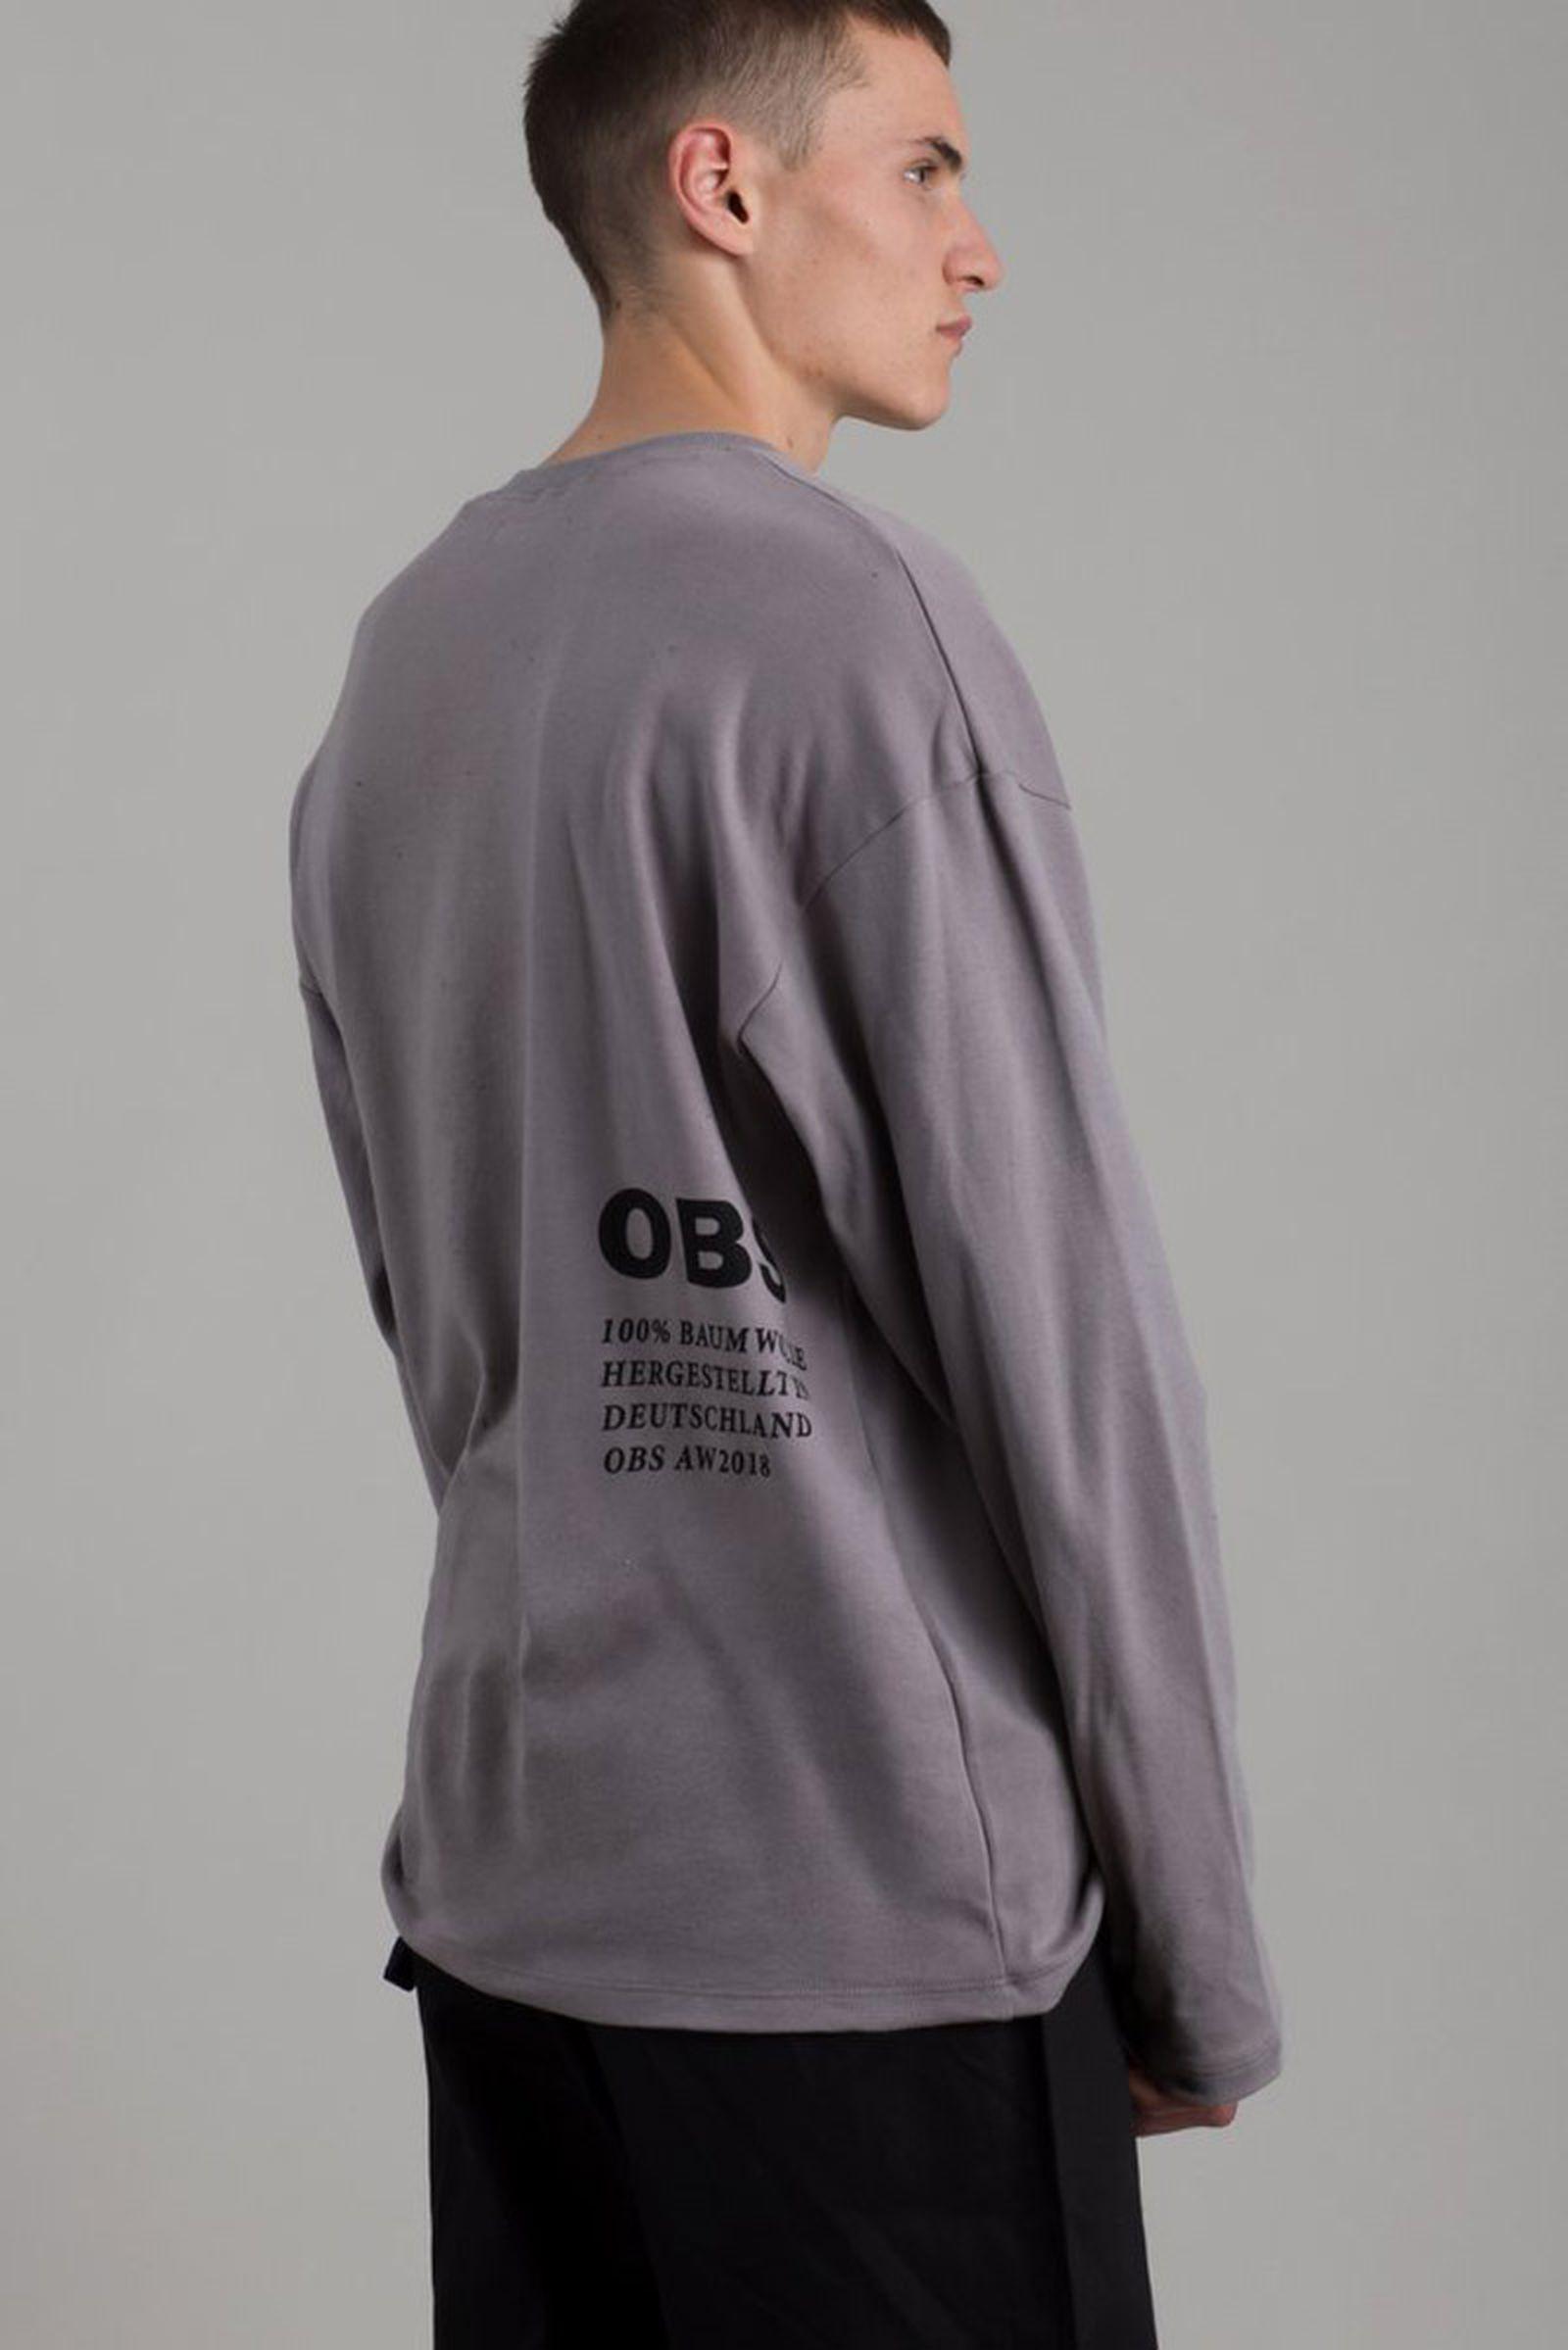 german clothing brands obs 023c Adidas Boulezar